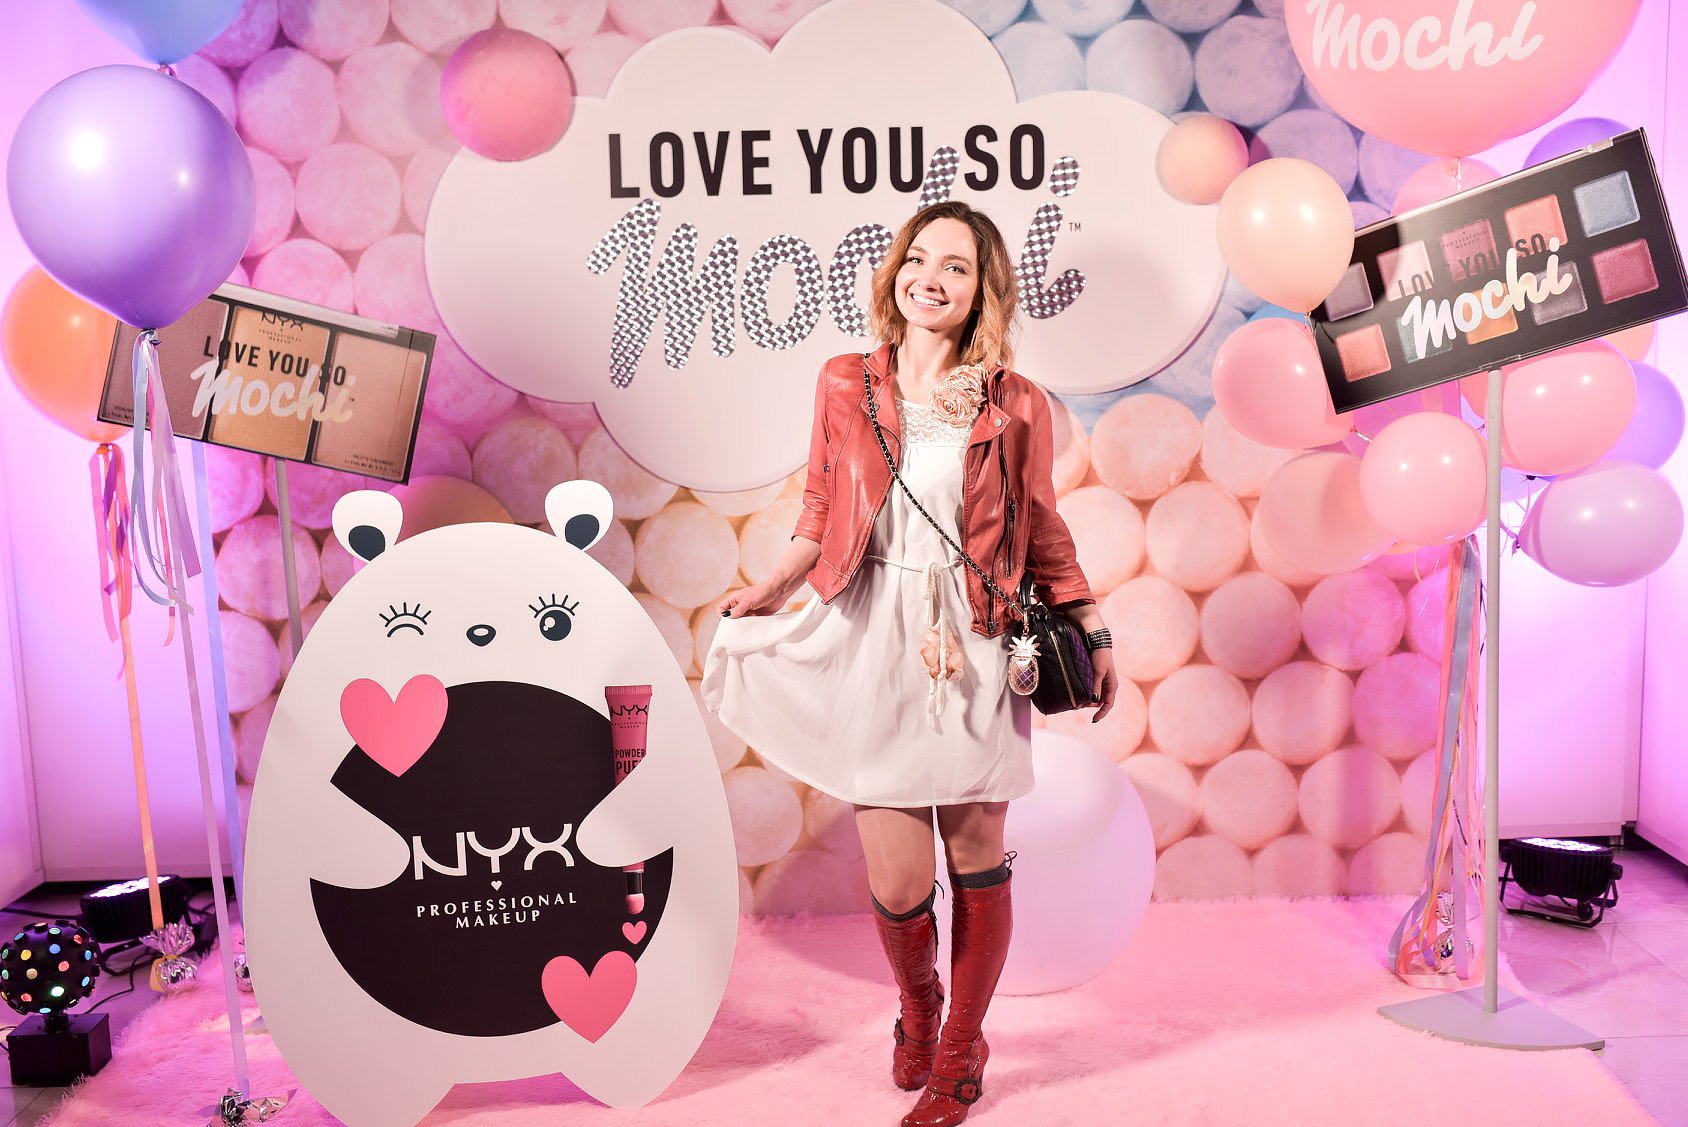 NYX, Love You So Mochi!